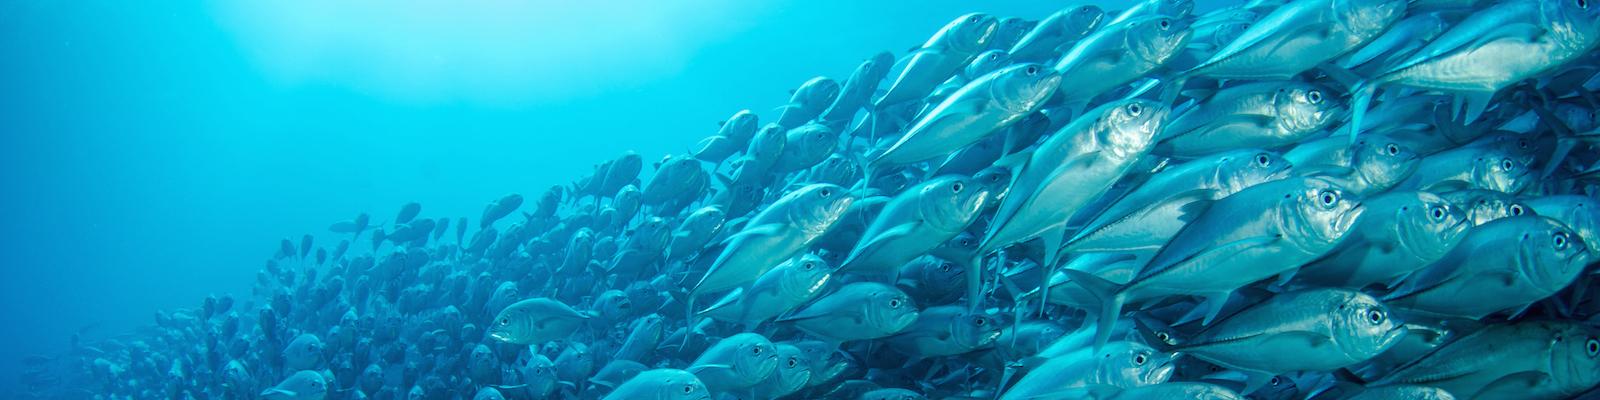 fish-swarm-1600